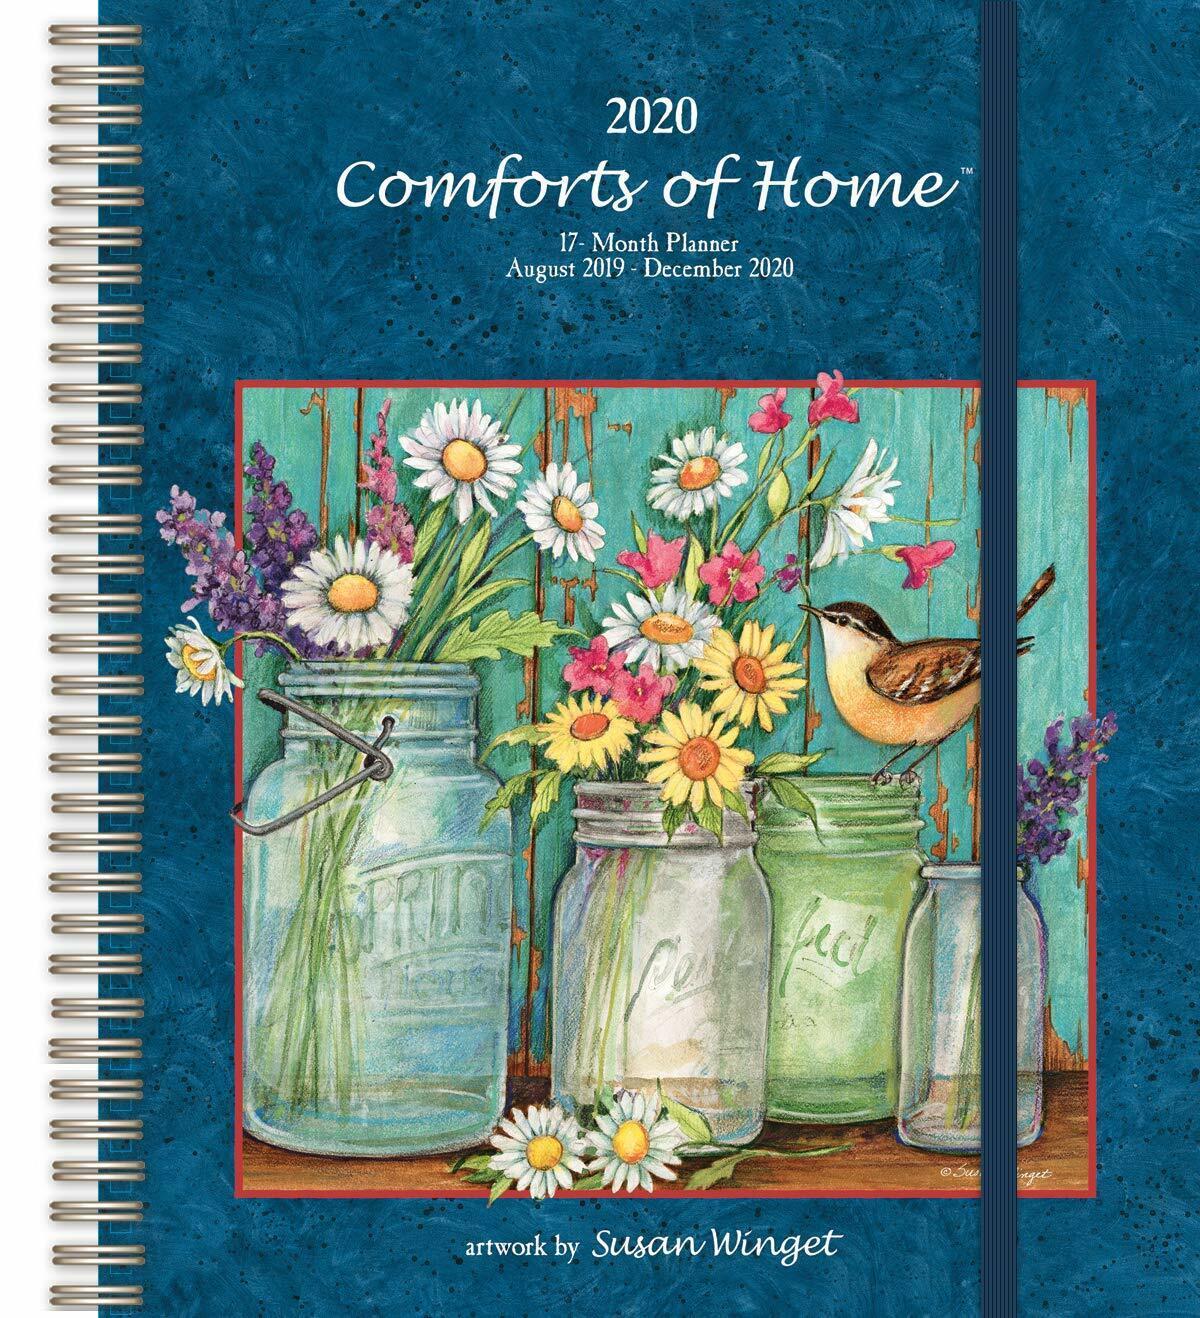 comforts of home 2020 deluxe planning calendar